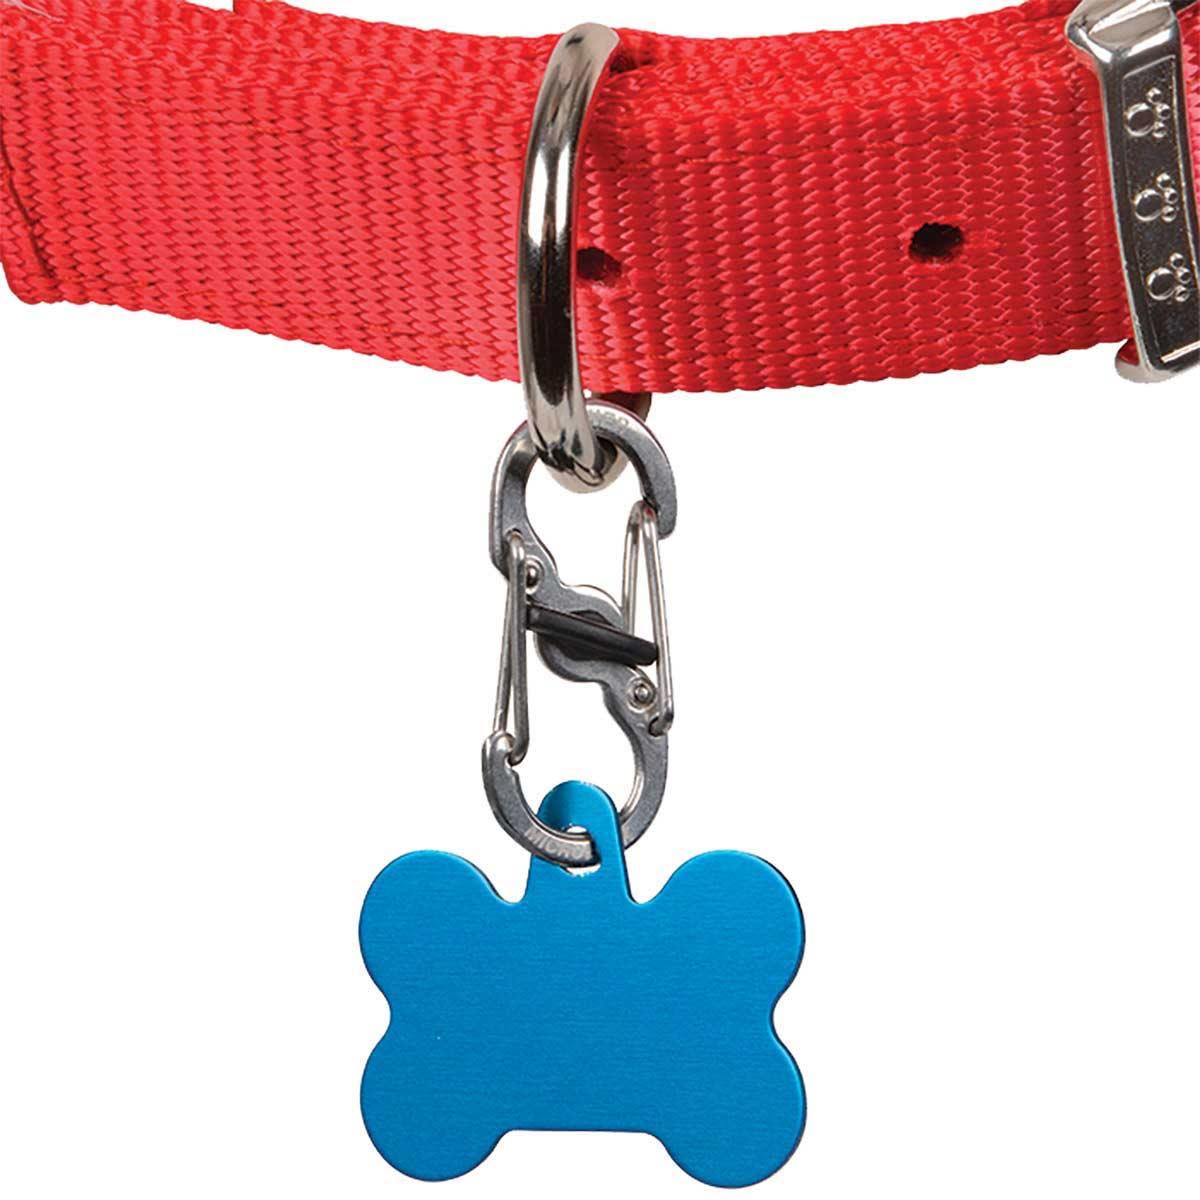 Nite Ize S-Biner Taglock for Dog Collars - Stainless-Steel